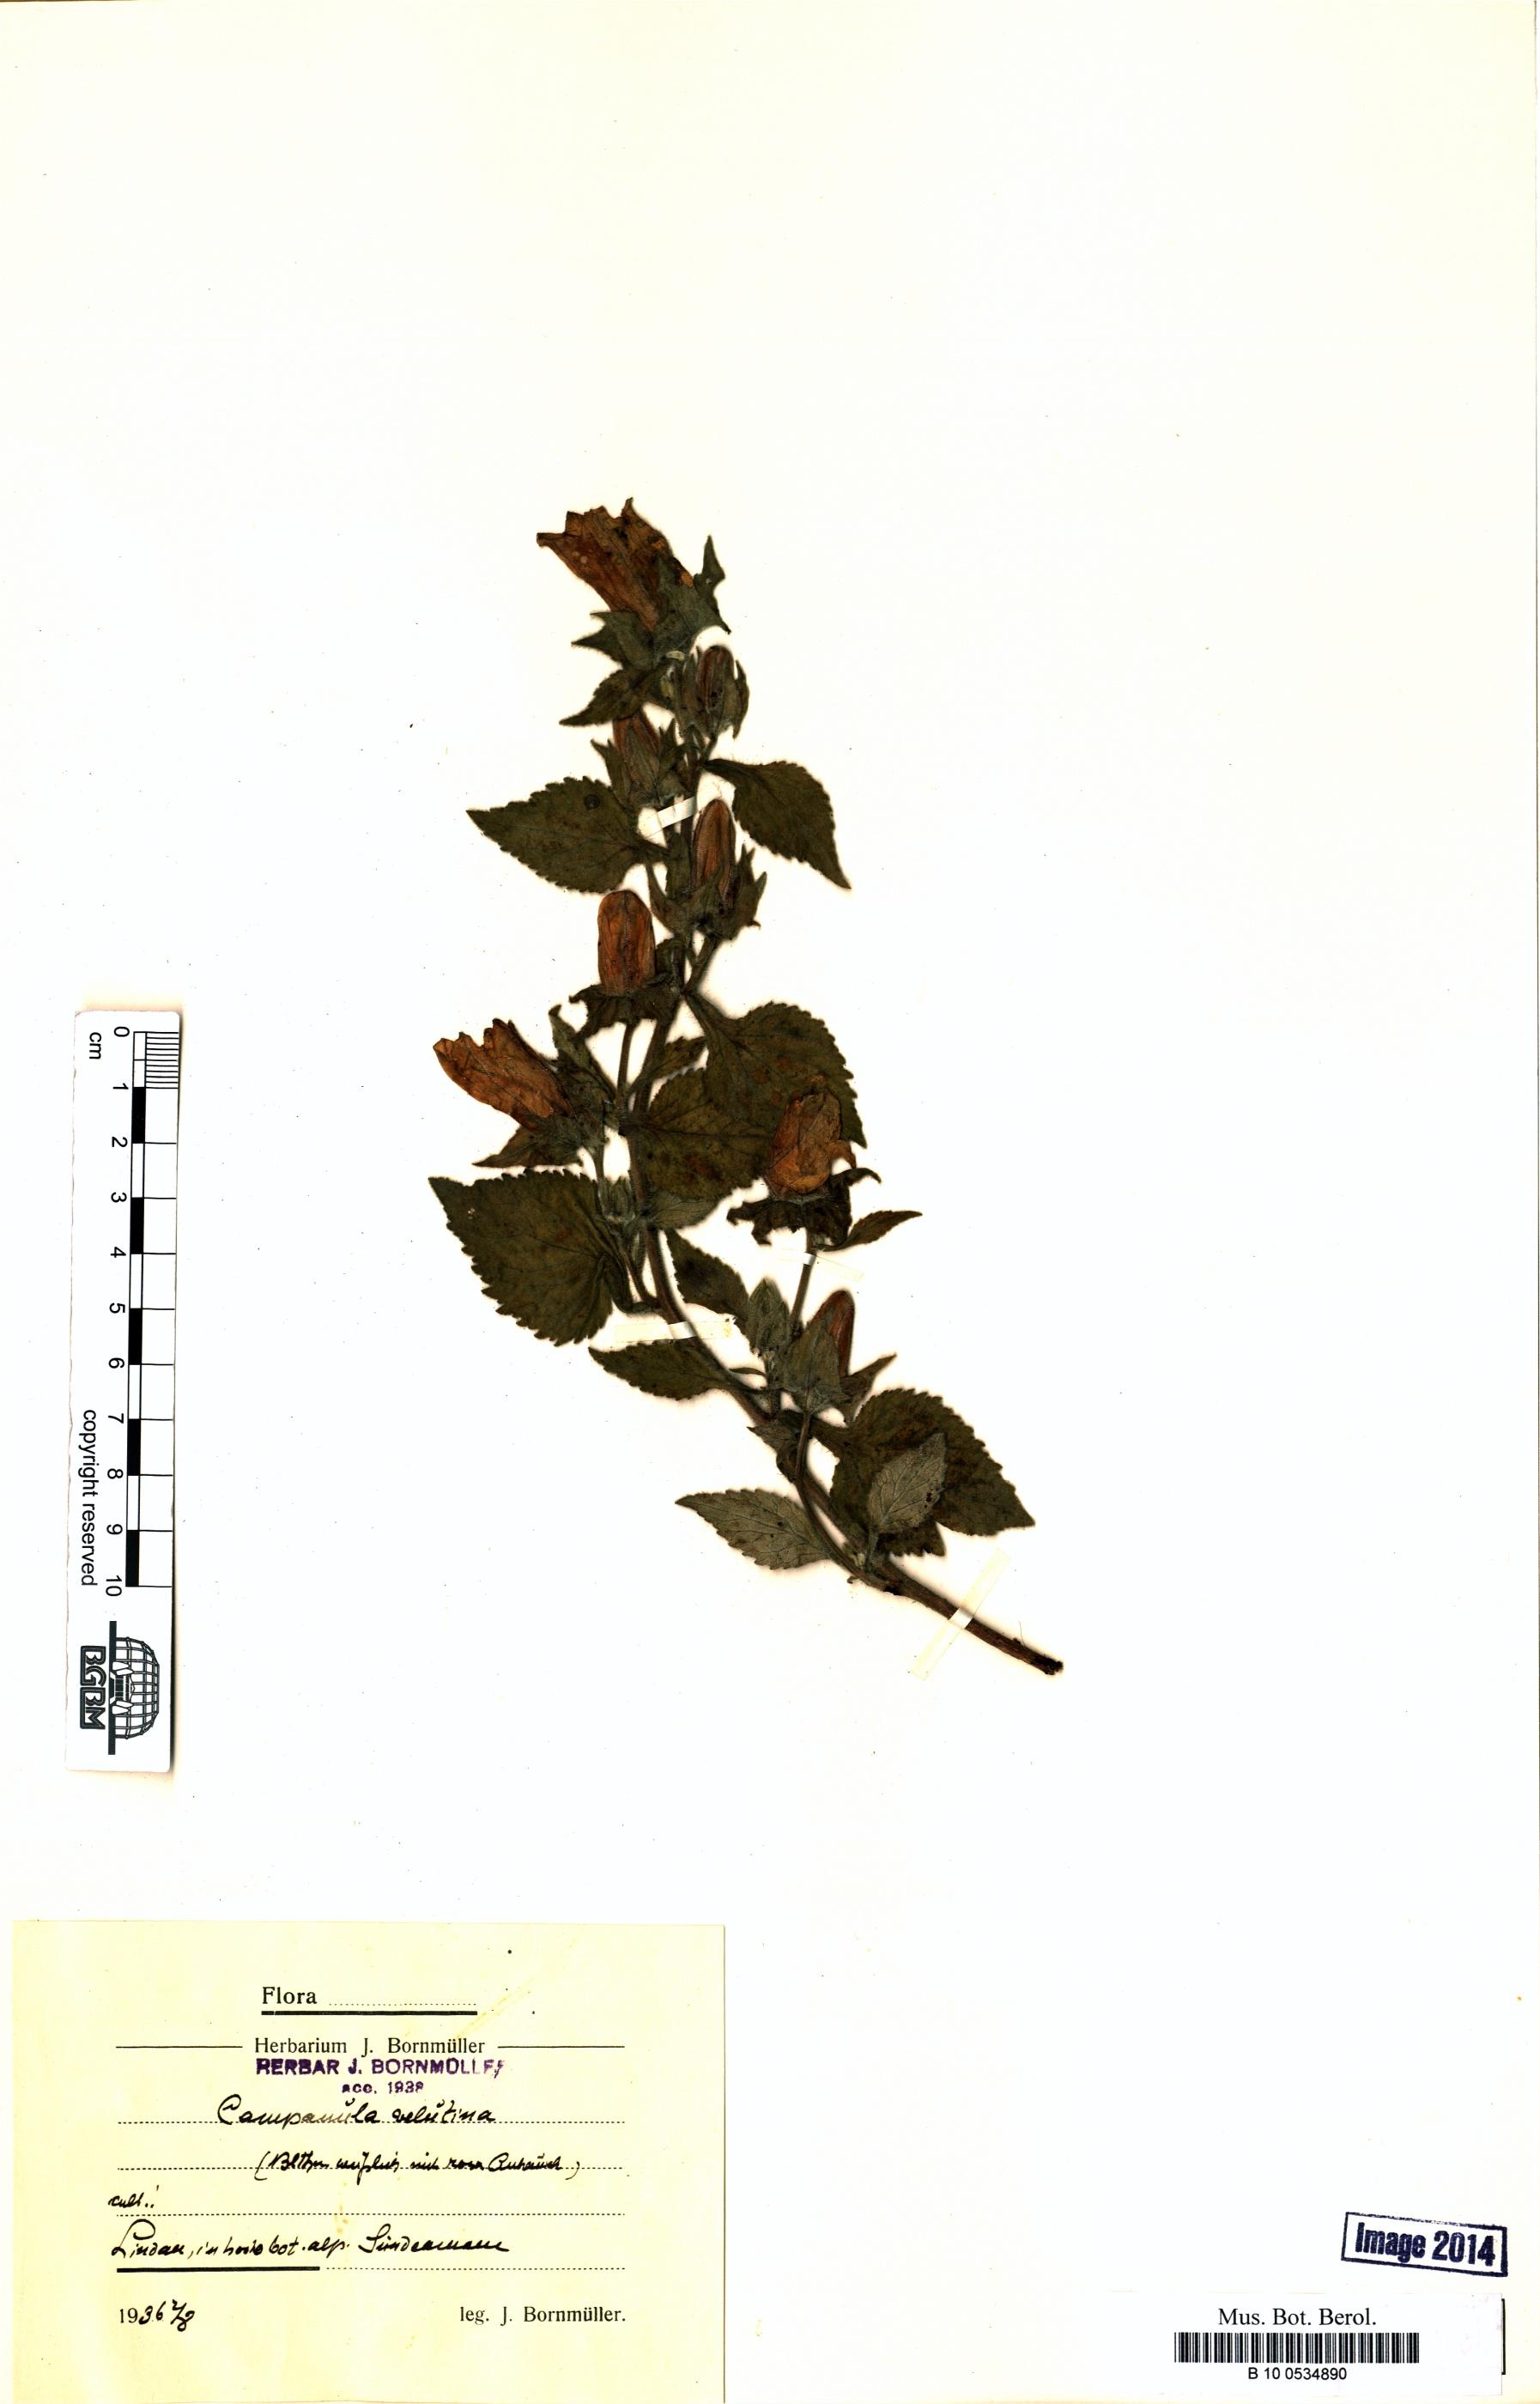 http://ww2.bgbm.org/herbarium/images/B/10/05/34/89/B_10_0534890.jpg